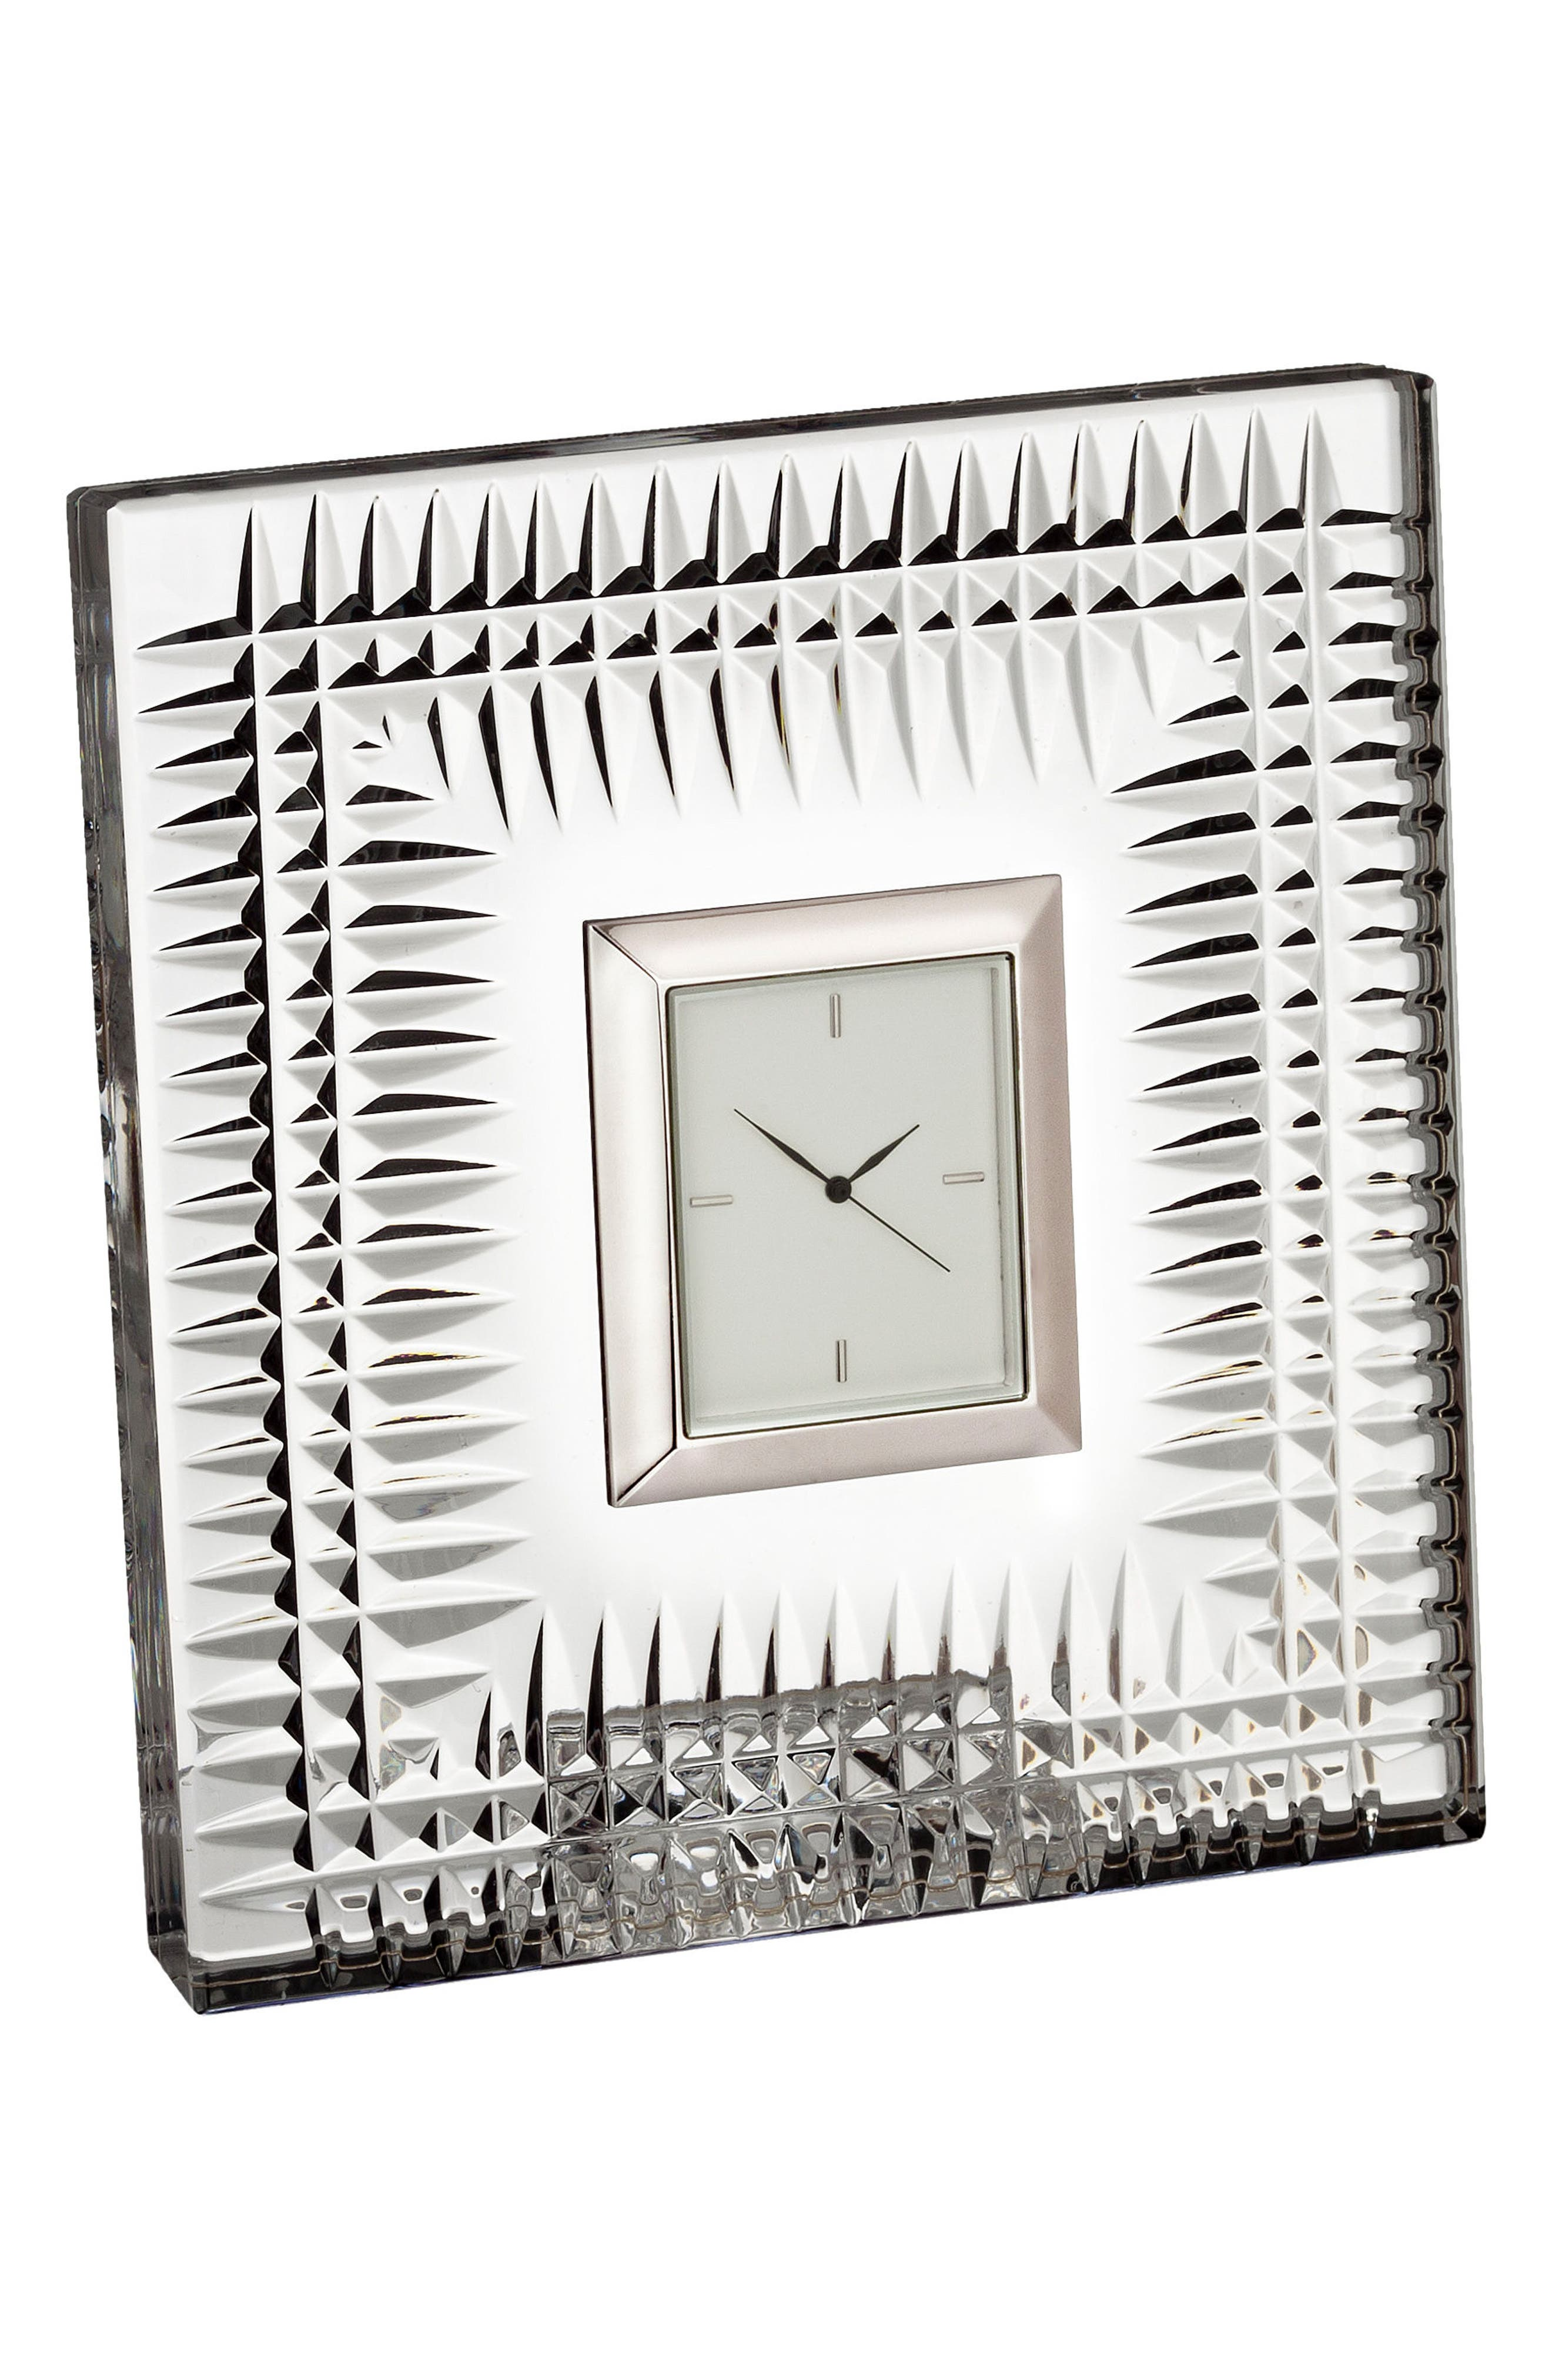 Main Image - Waterford Lismore Diamond Crystal Clock